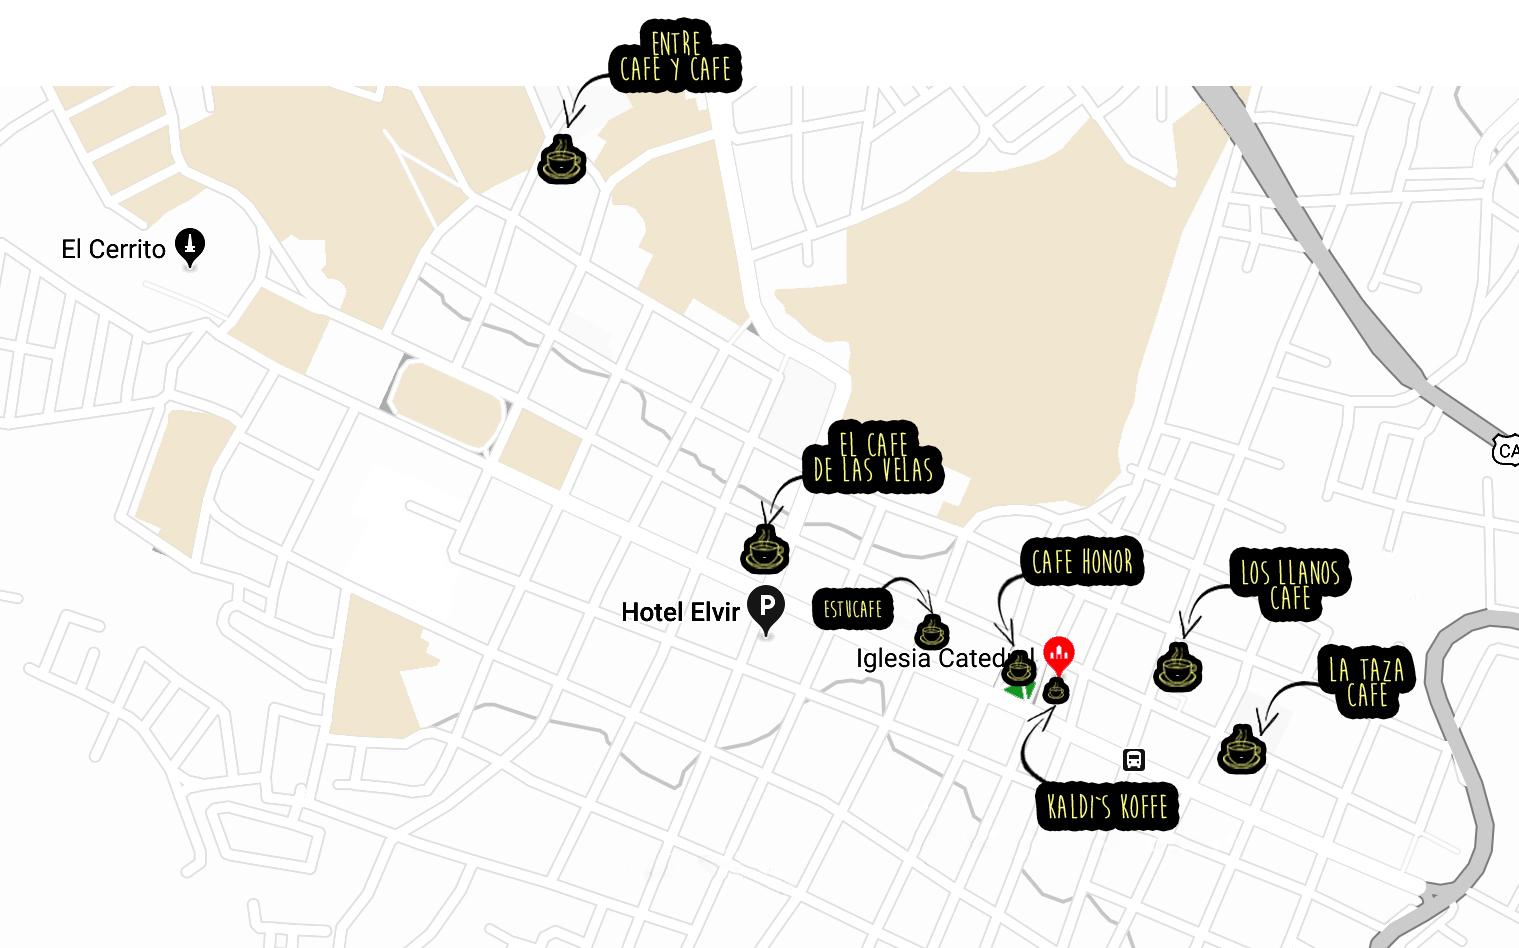 mapa de cafes de Santa Rosa de copan honduras jose vargas moda fashion lifestyle